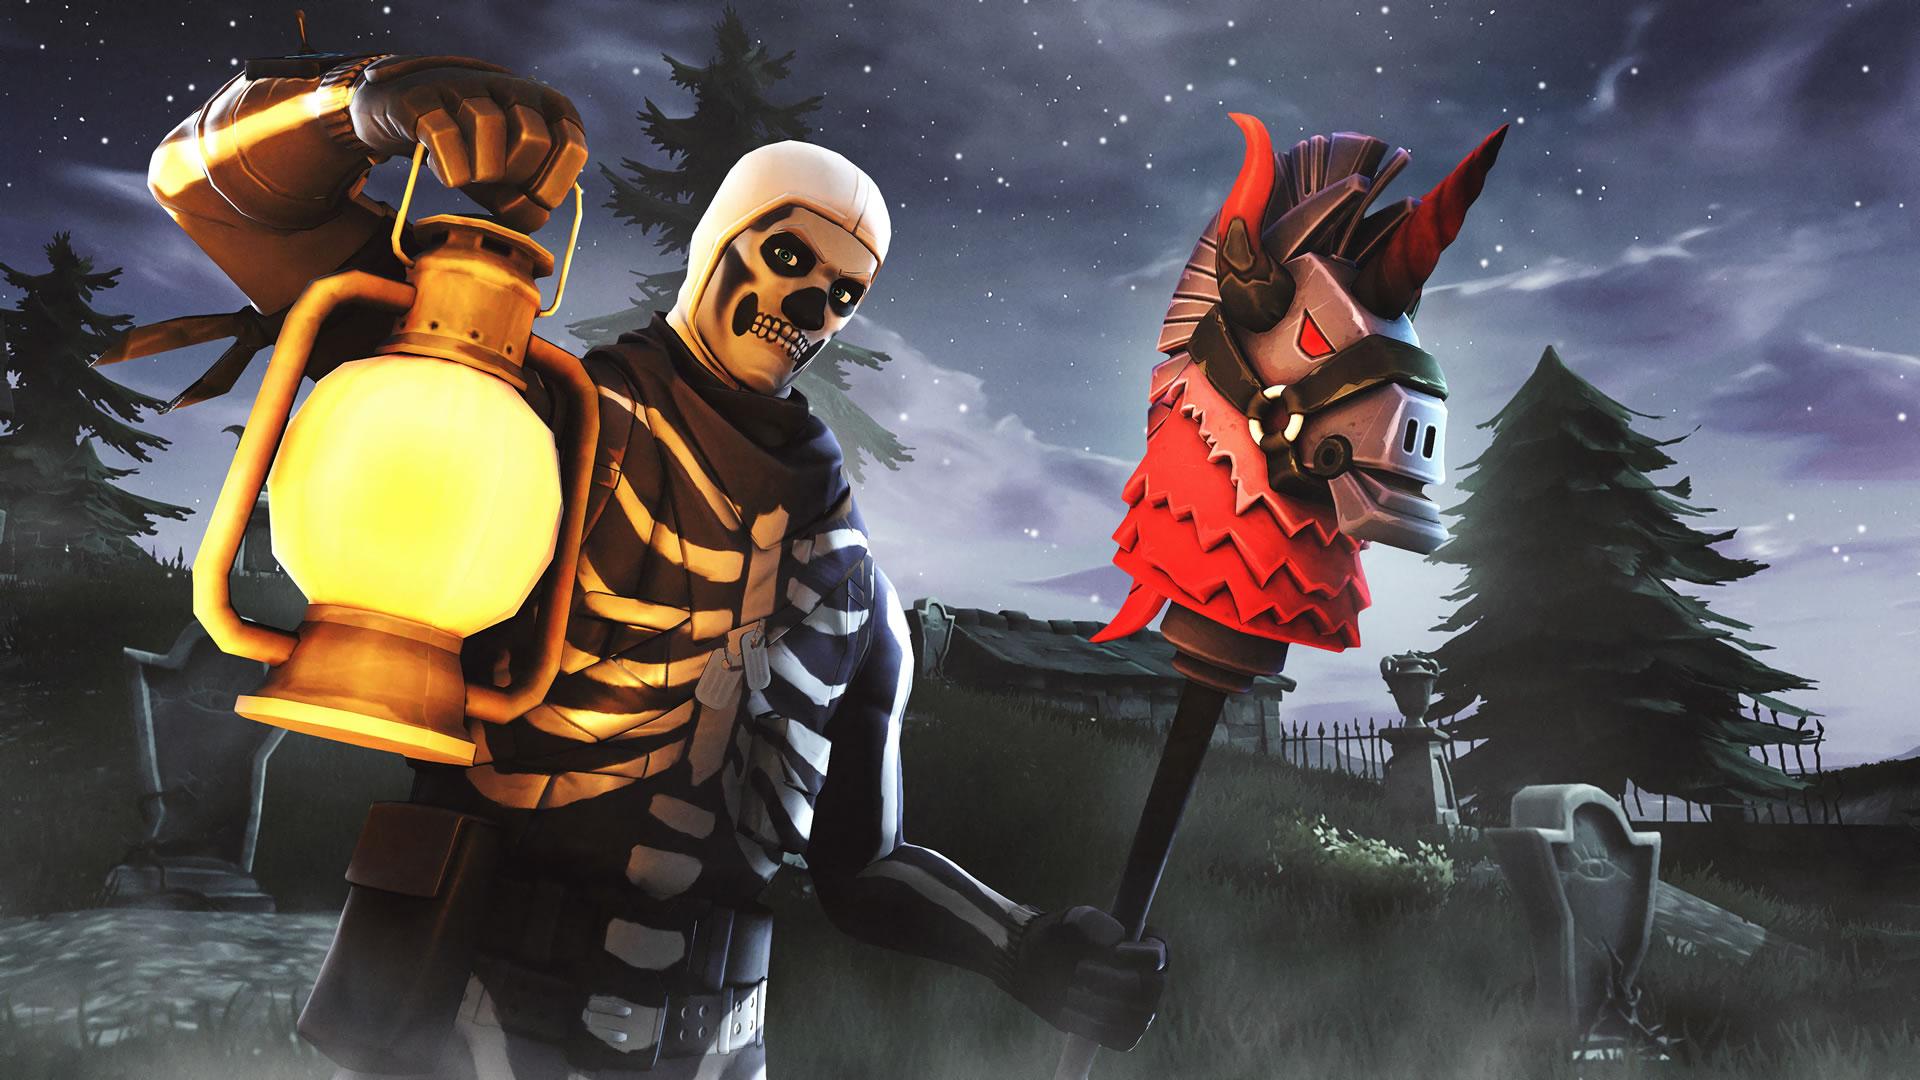 download wallpaper: Fortnite -Skull Trooper wallpaper